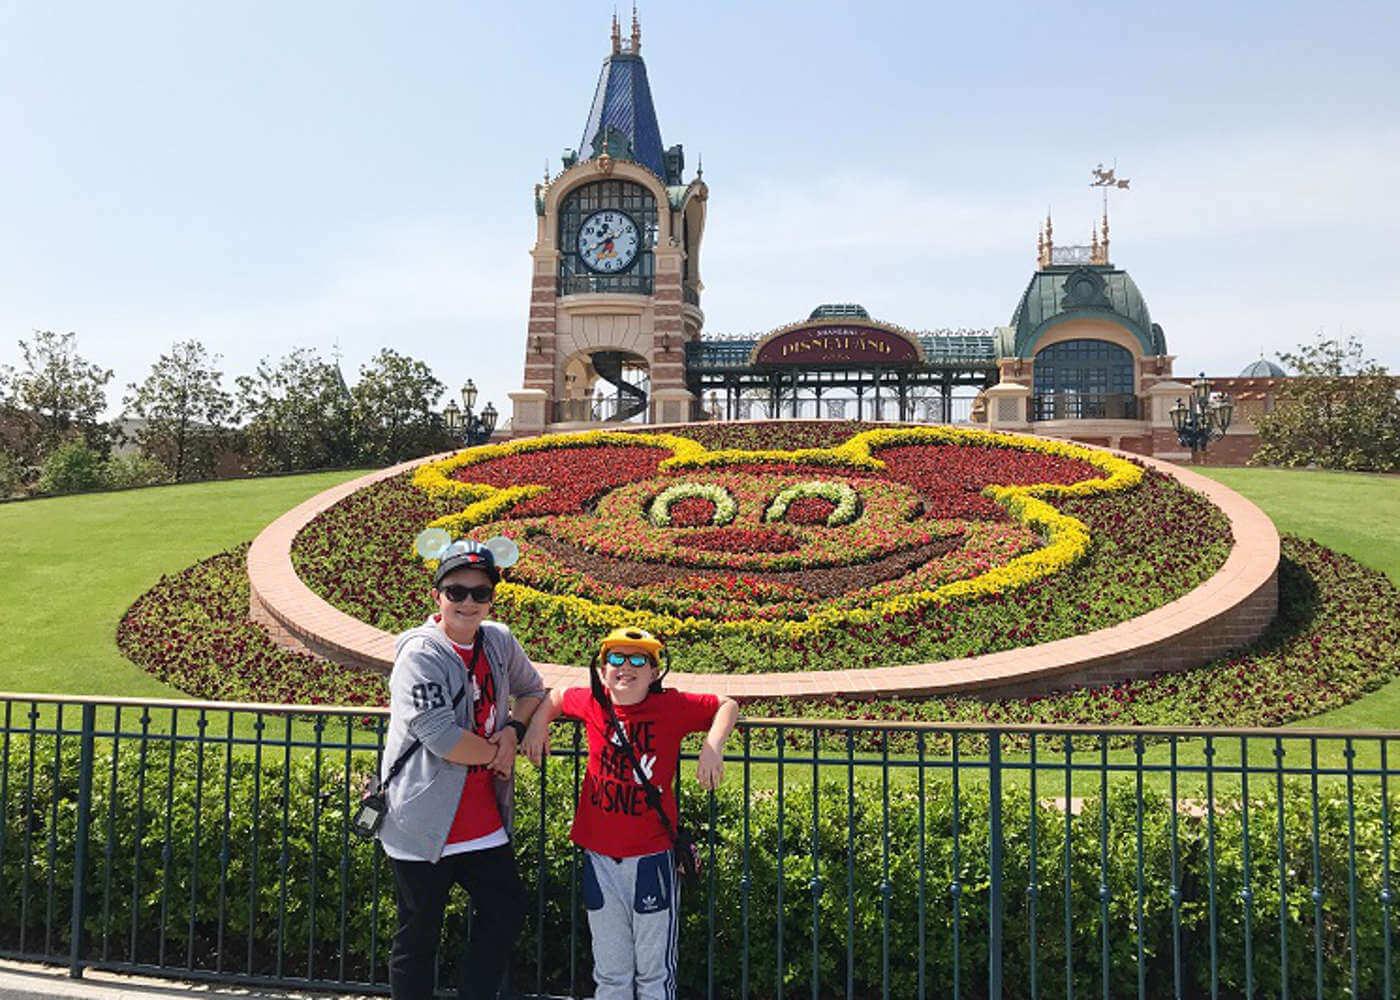 disneyland shanghai entrance